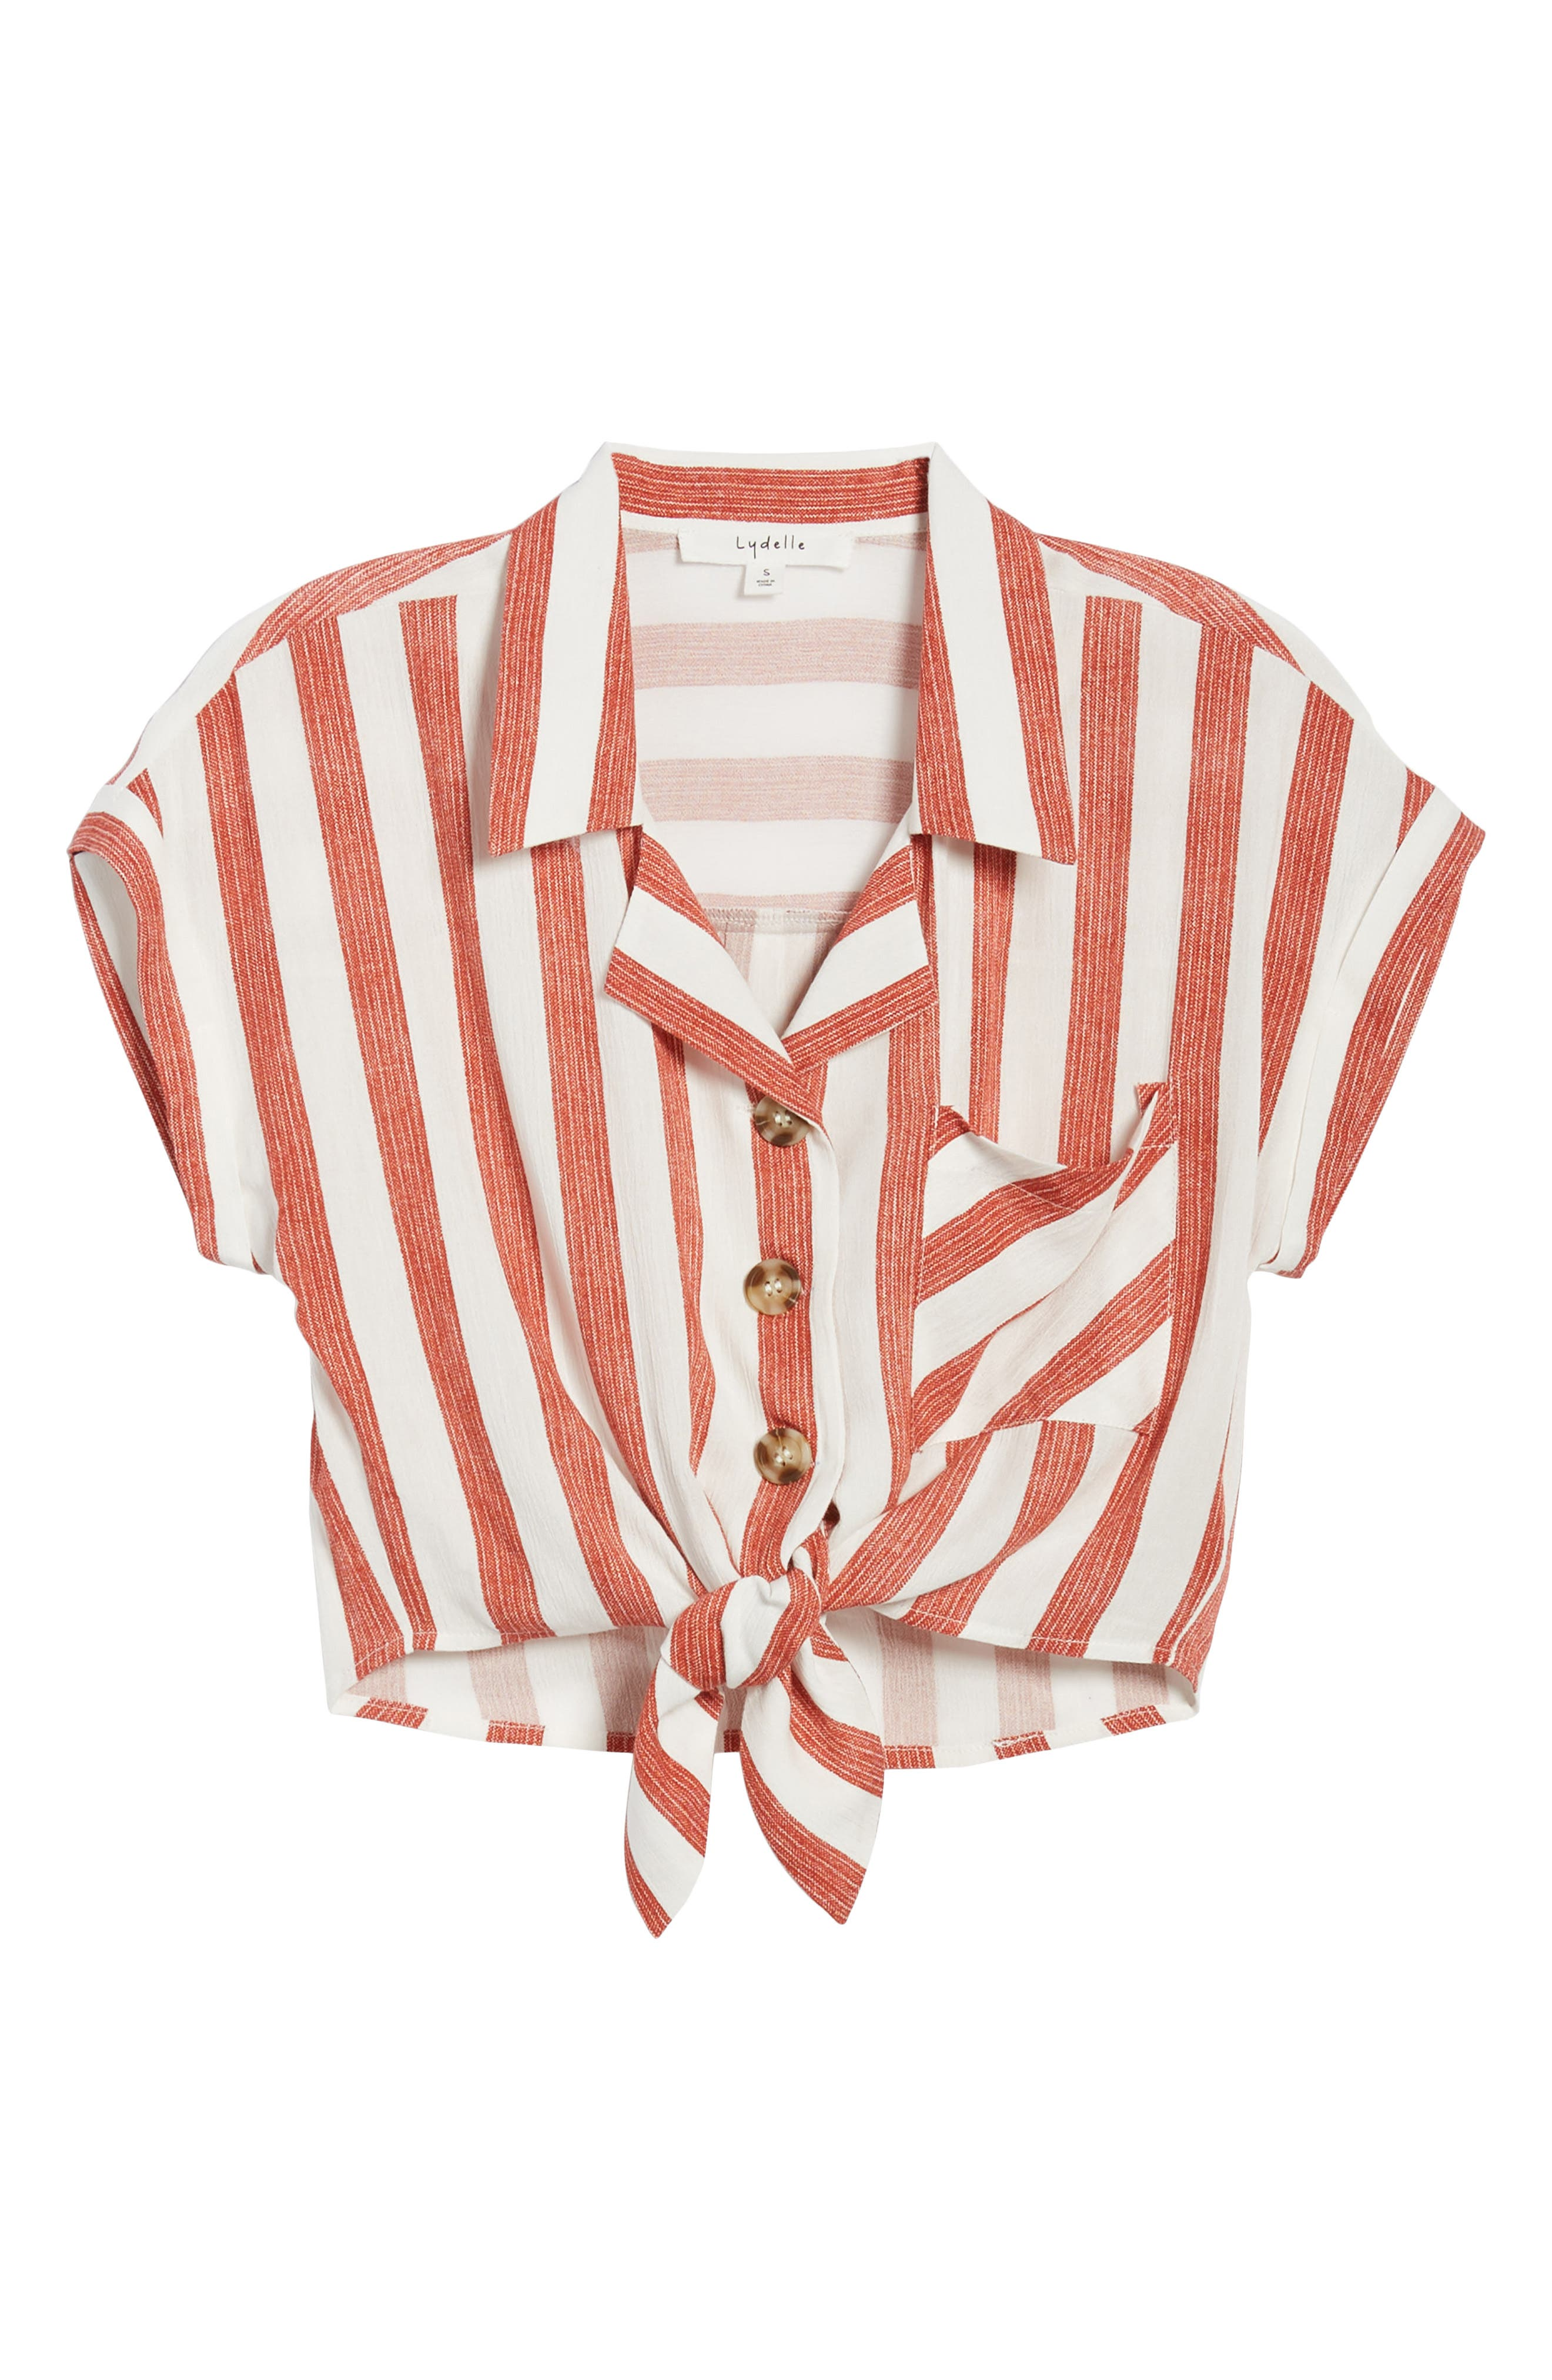 Stripe Tie Front Top,                             Alternate thumbnail 7, color,                             600